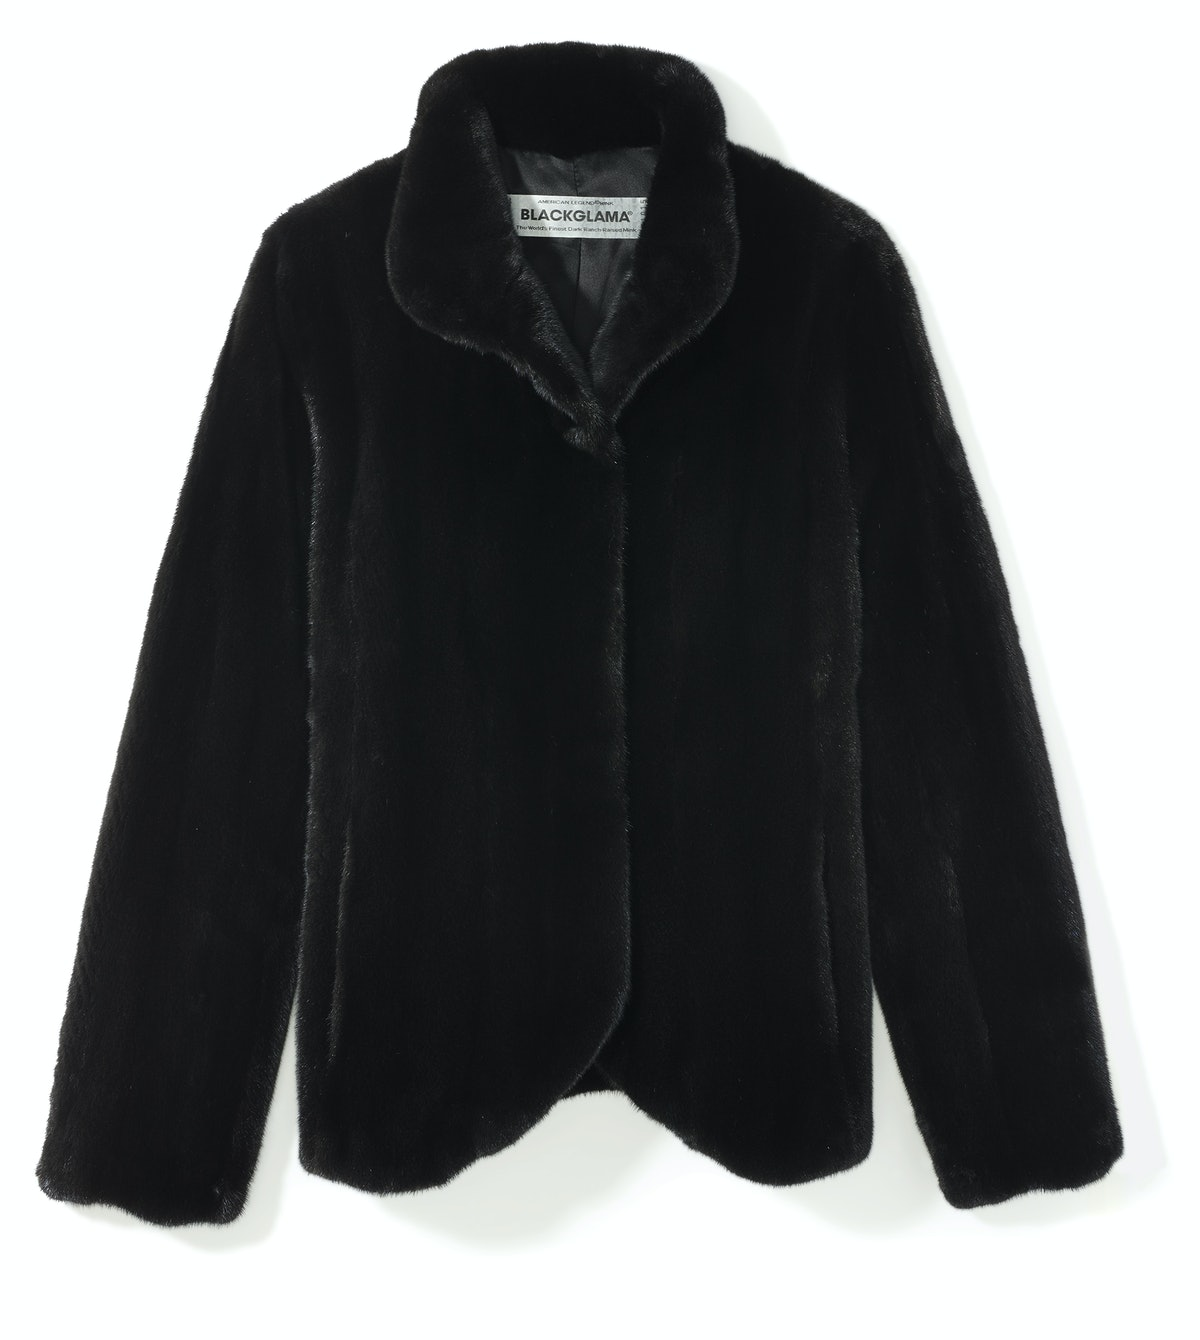 Blackglama coat